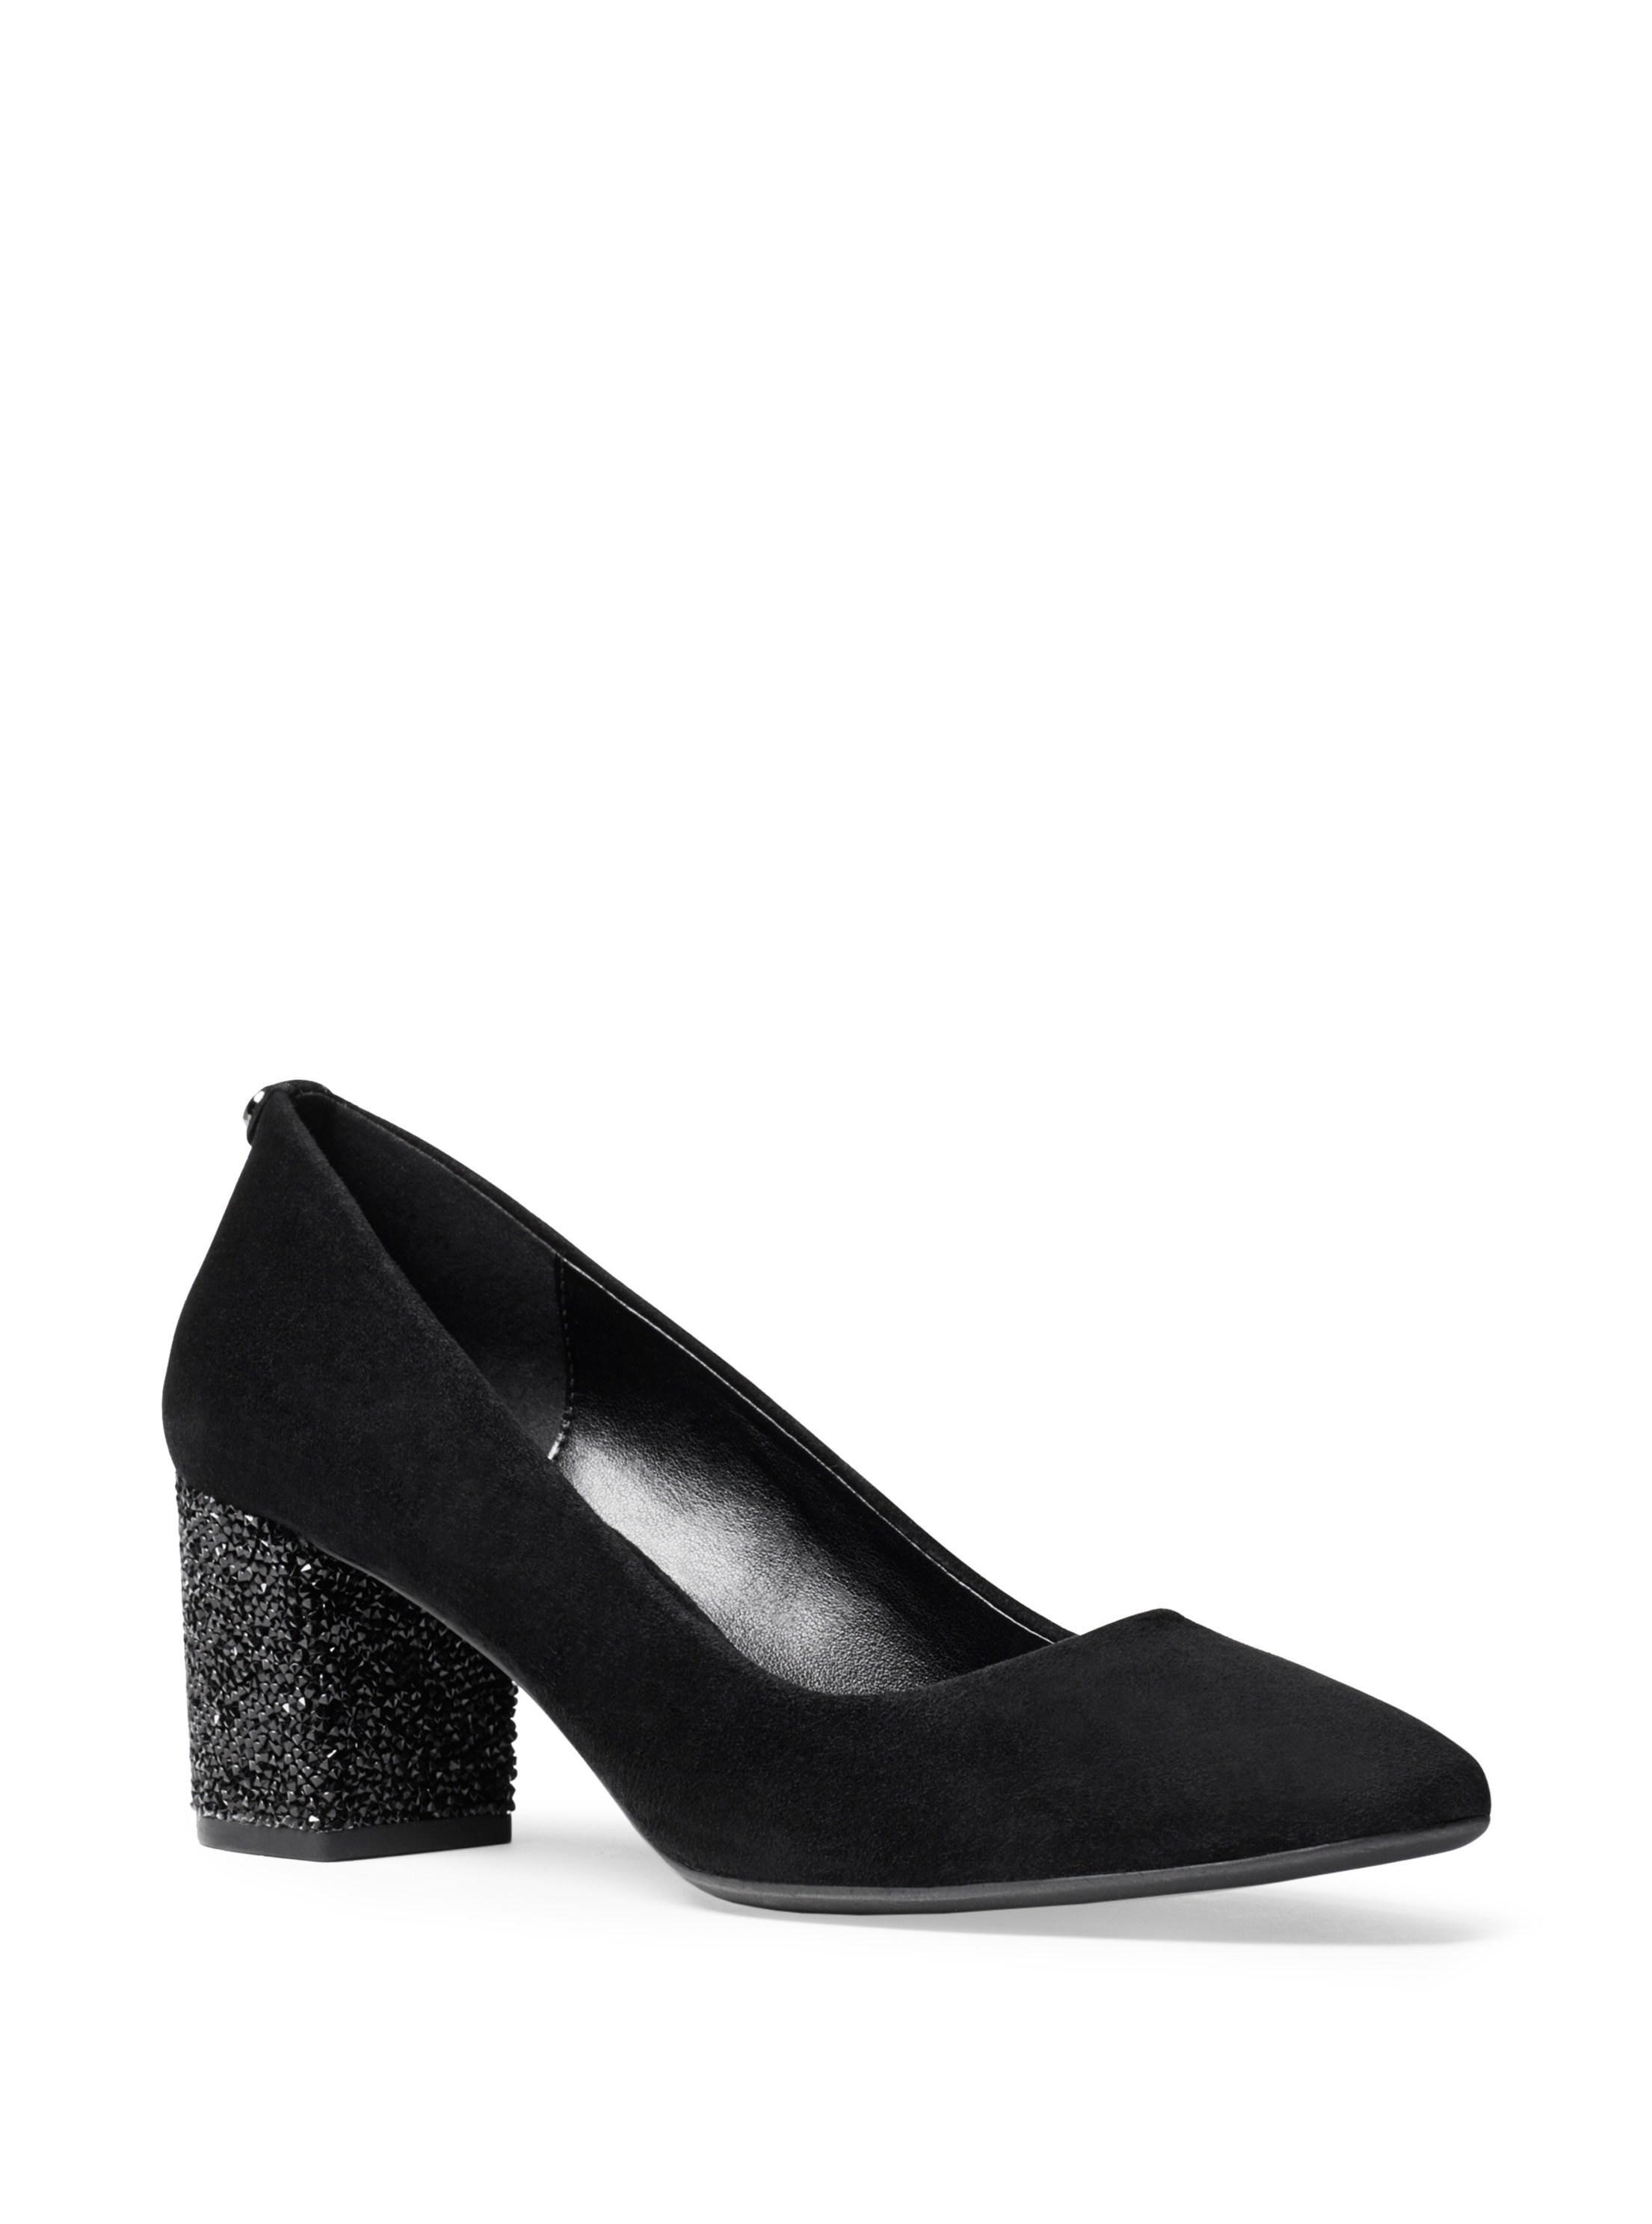 b6e8e615b7ff MICHAEL Michael Kors. Women s Black Dorothy Leather Court Shoes